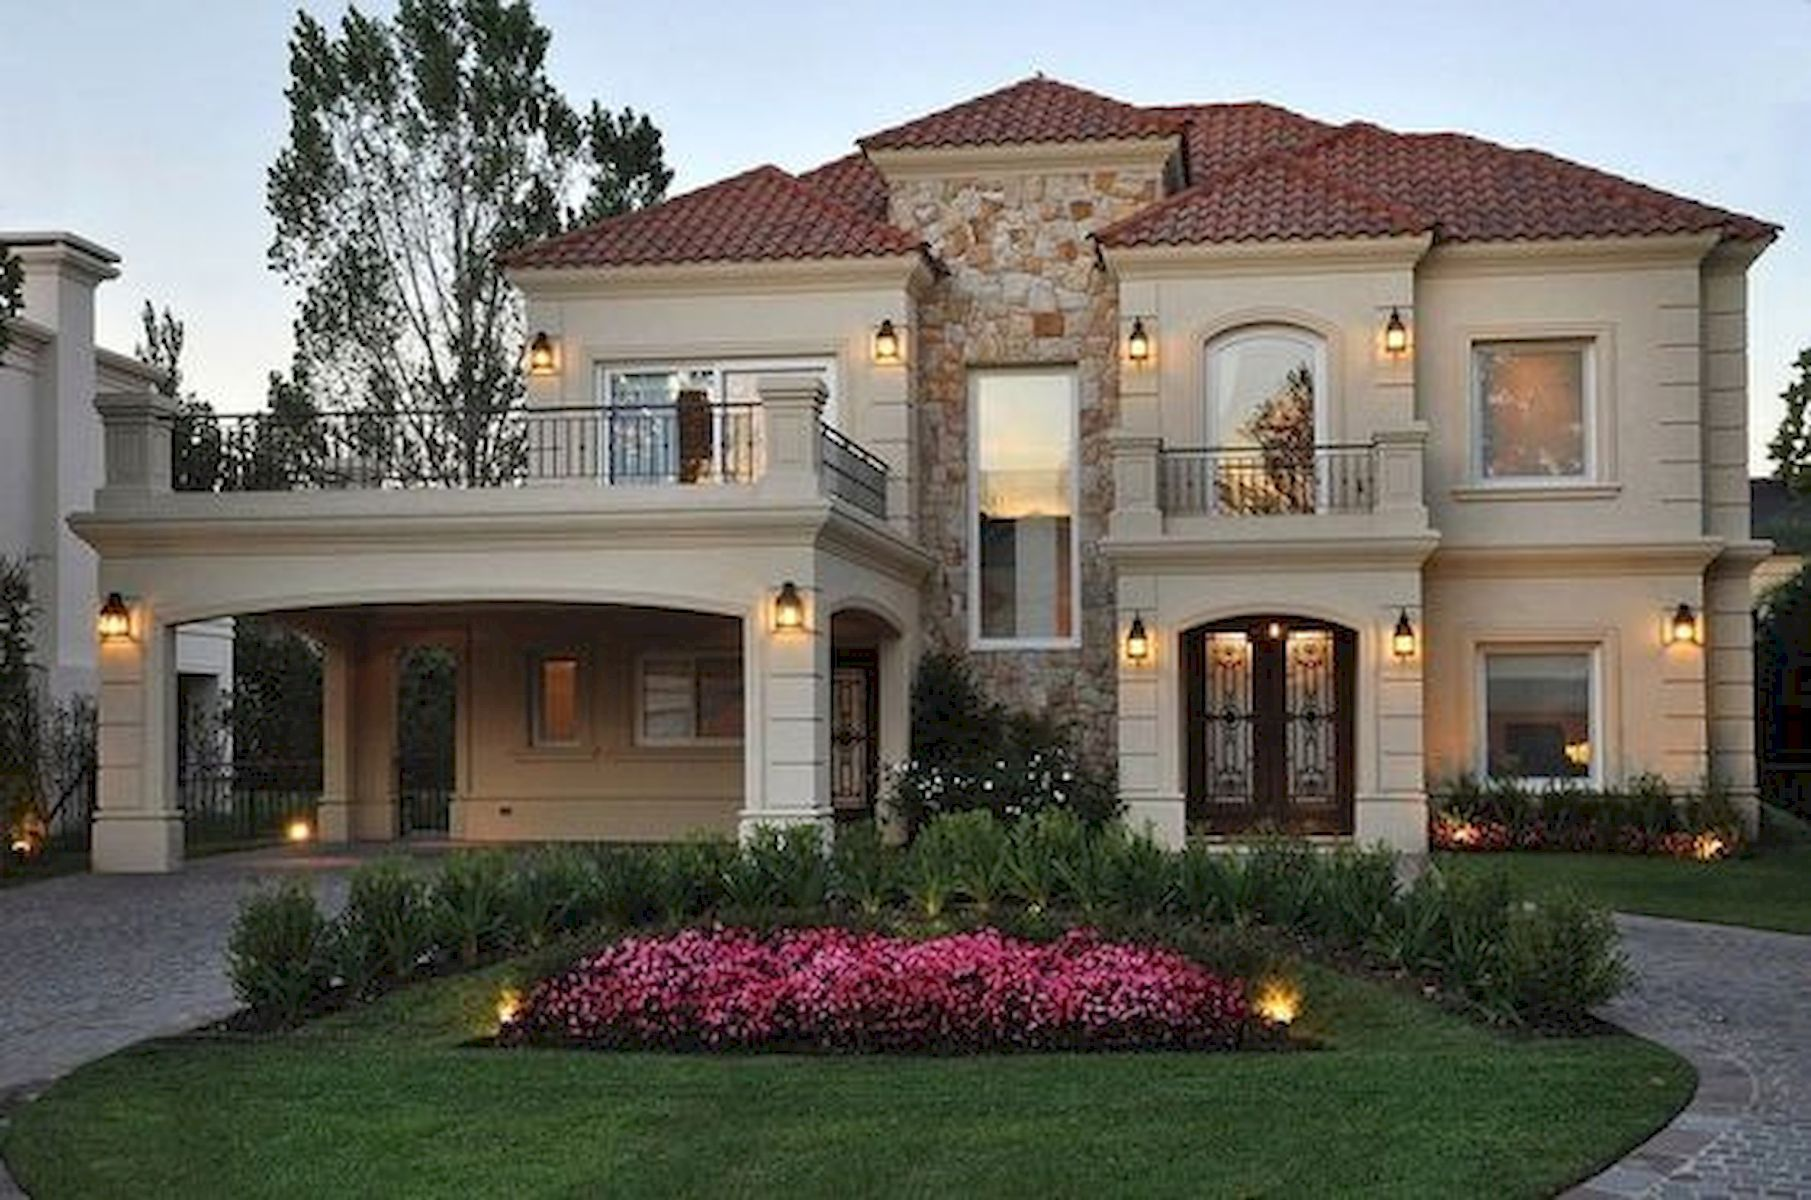 Pin By Lezama Erika On Architectural Design Luxury Homes Exterior House Designs Exterior Dream House Exterior